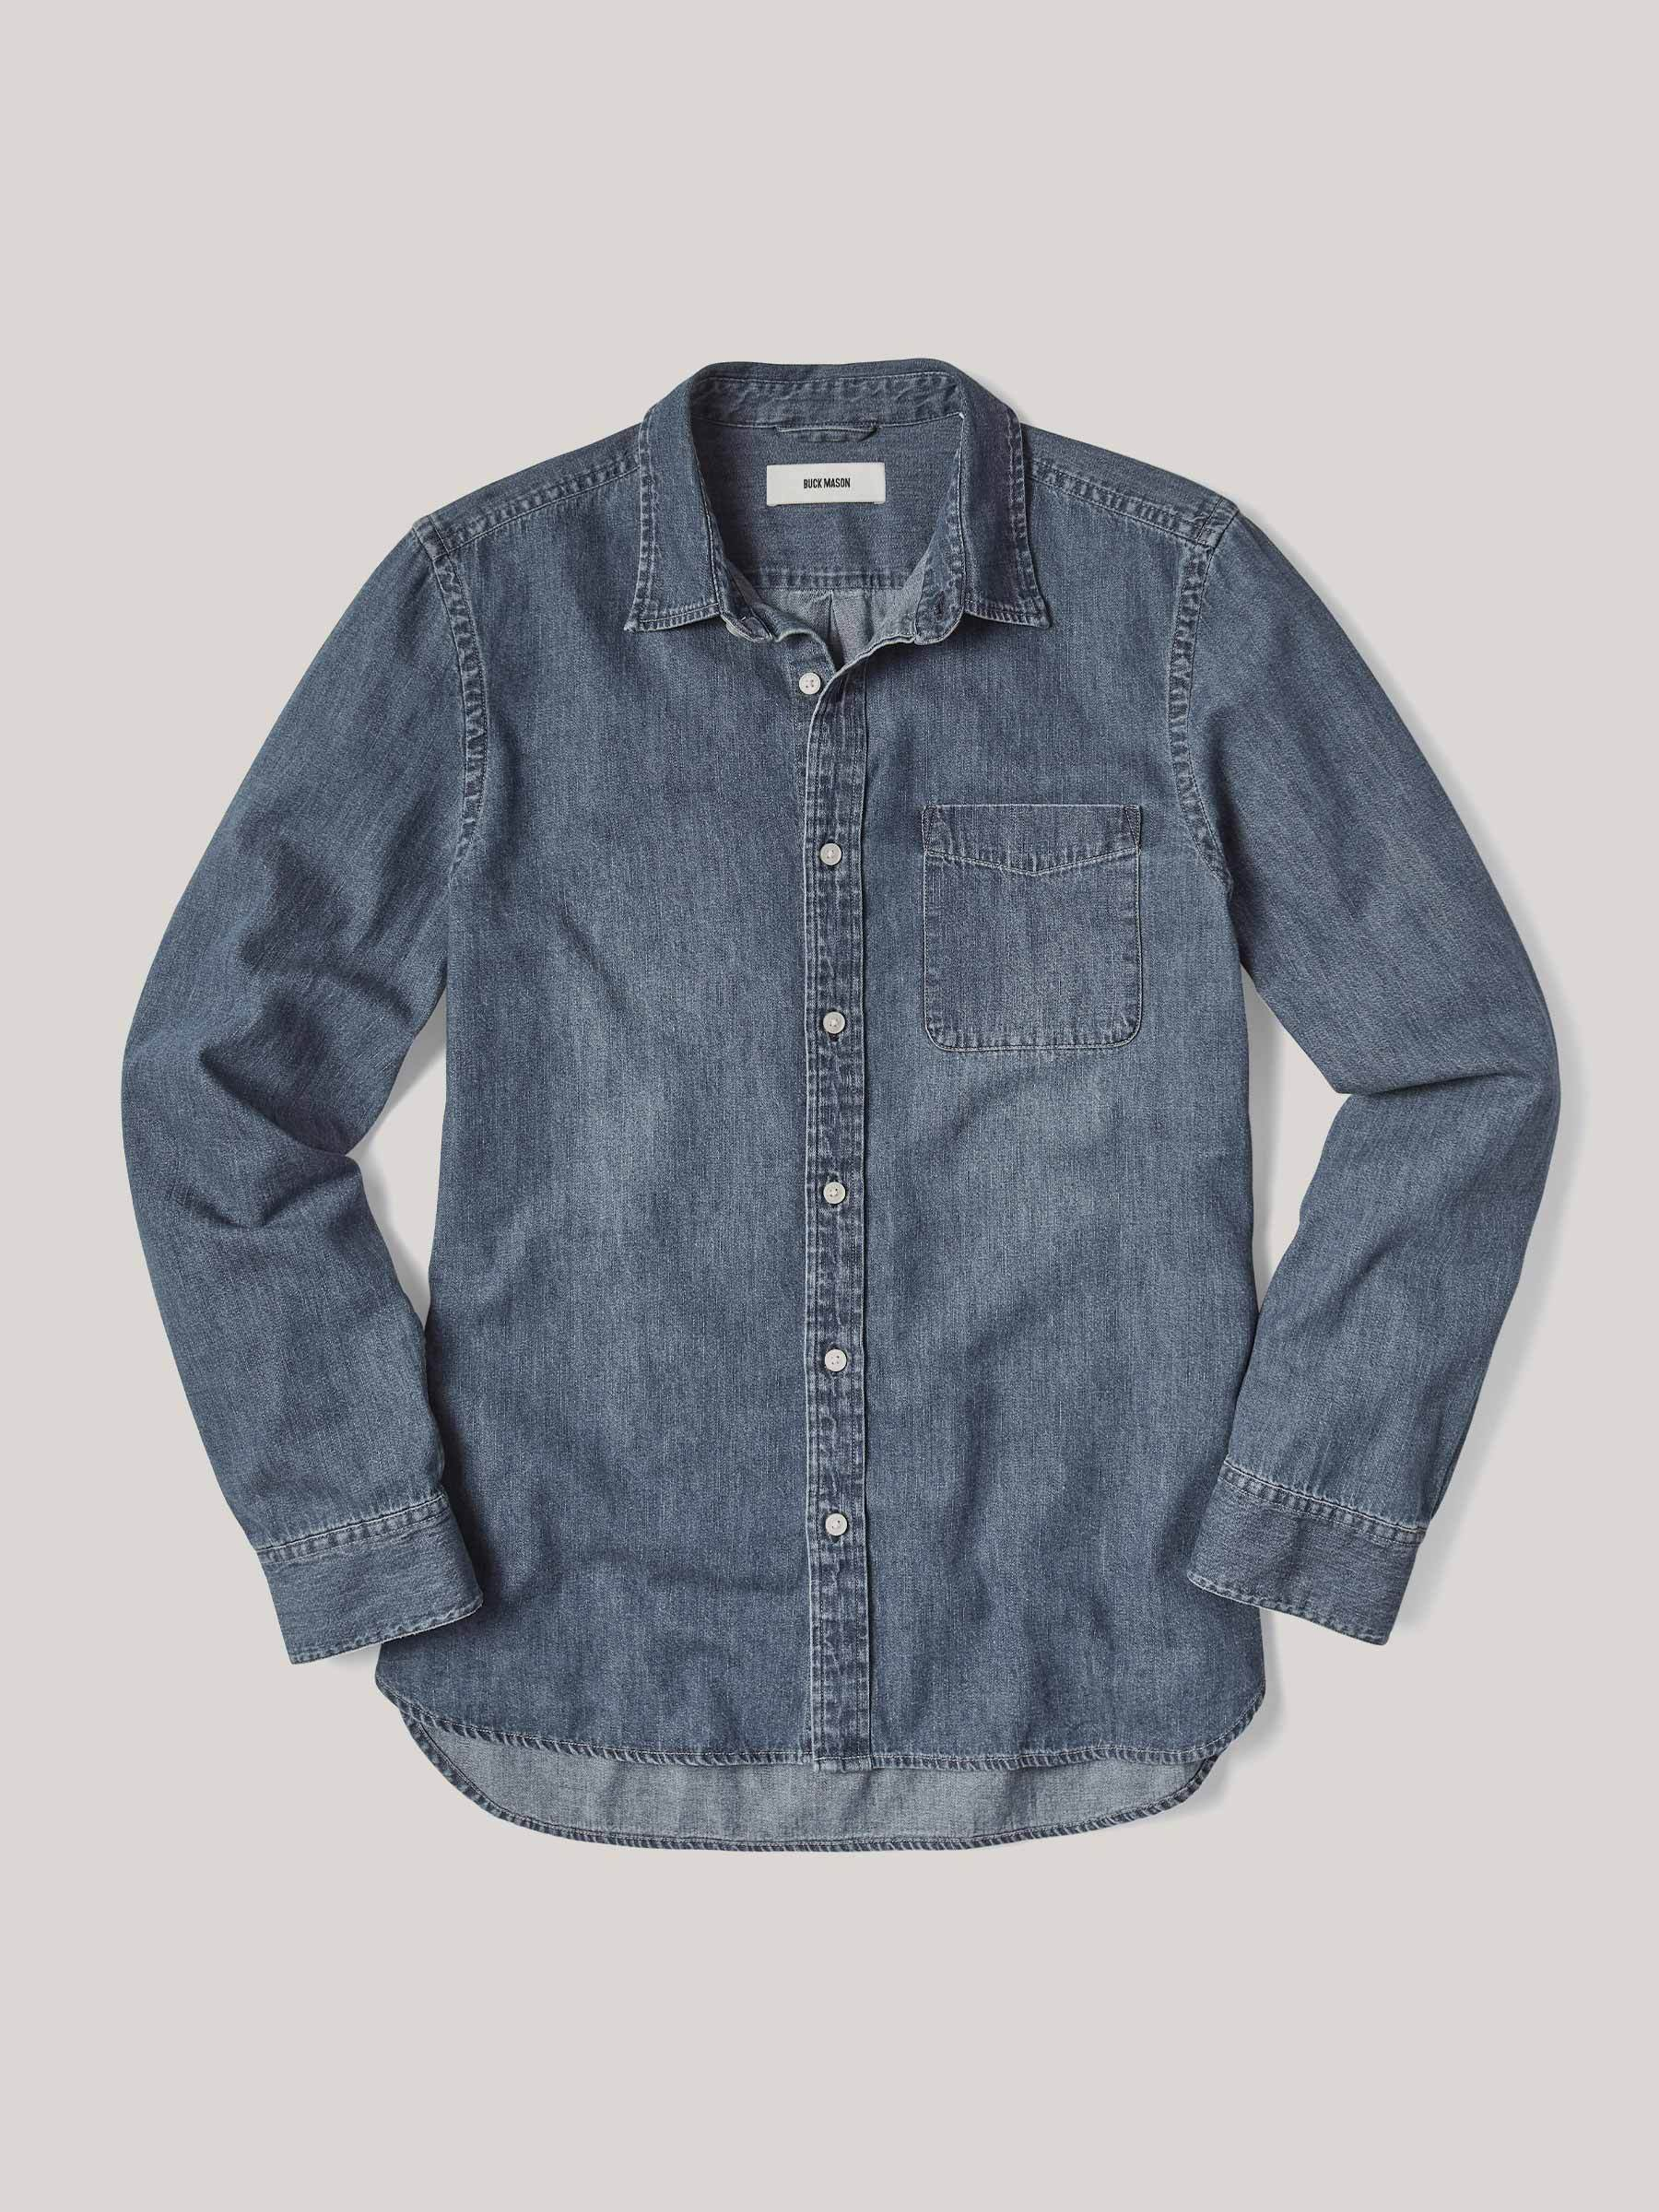 Buck Mason Denim Vintage One-Pocket Shirt